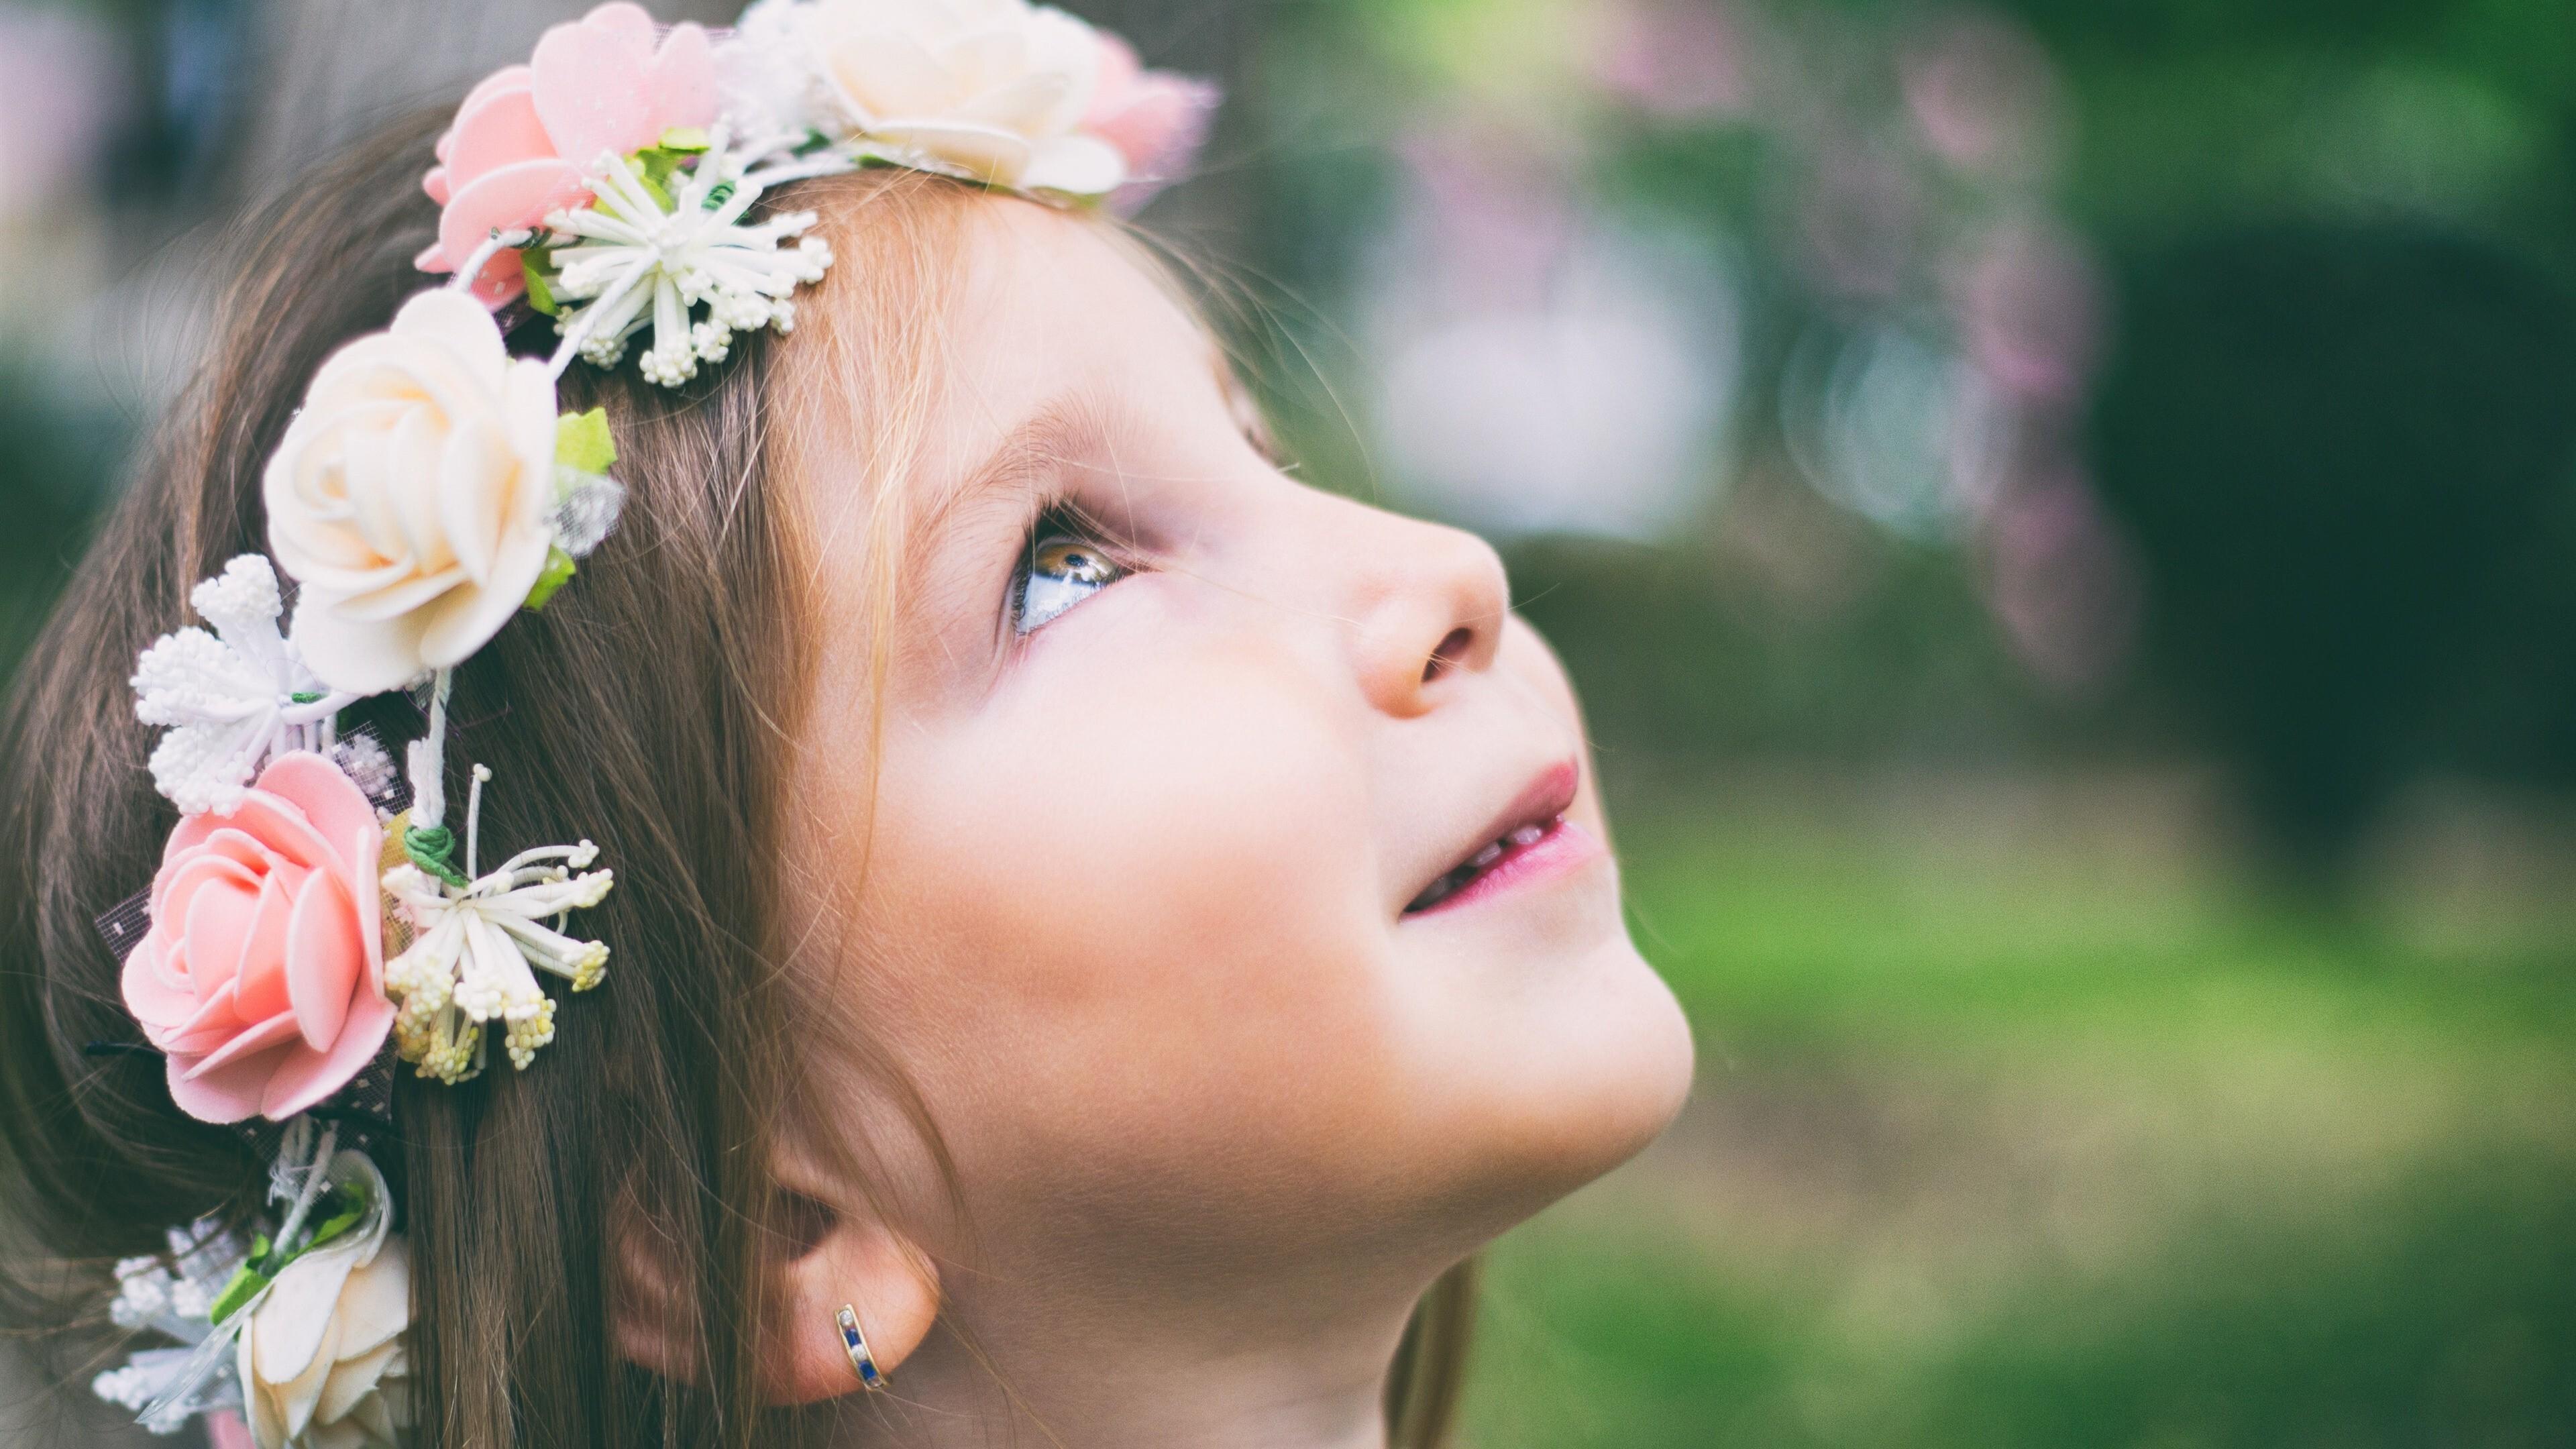 graceful baby girl wearing flower ring 4k wallpaper | hd wallpapers